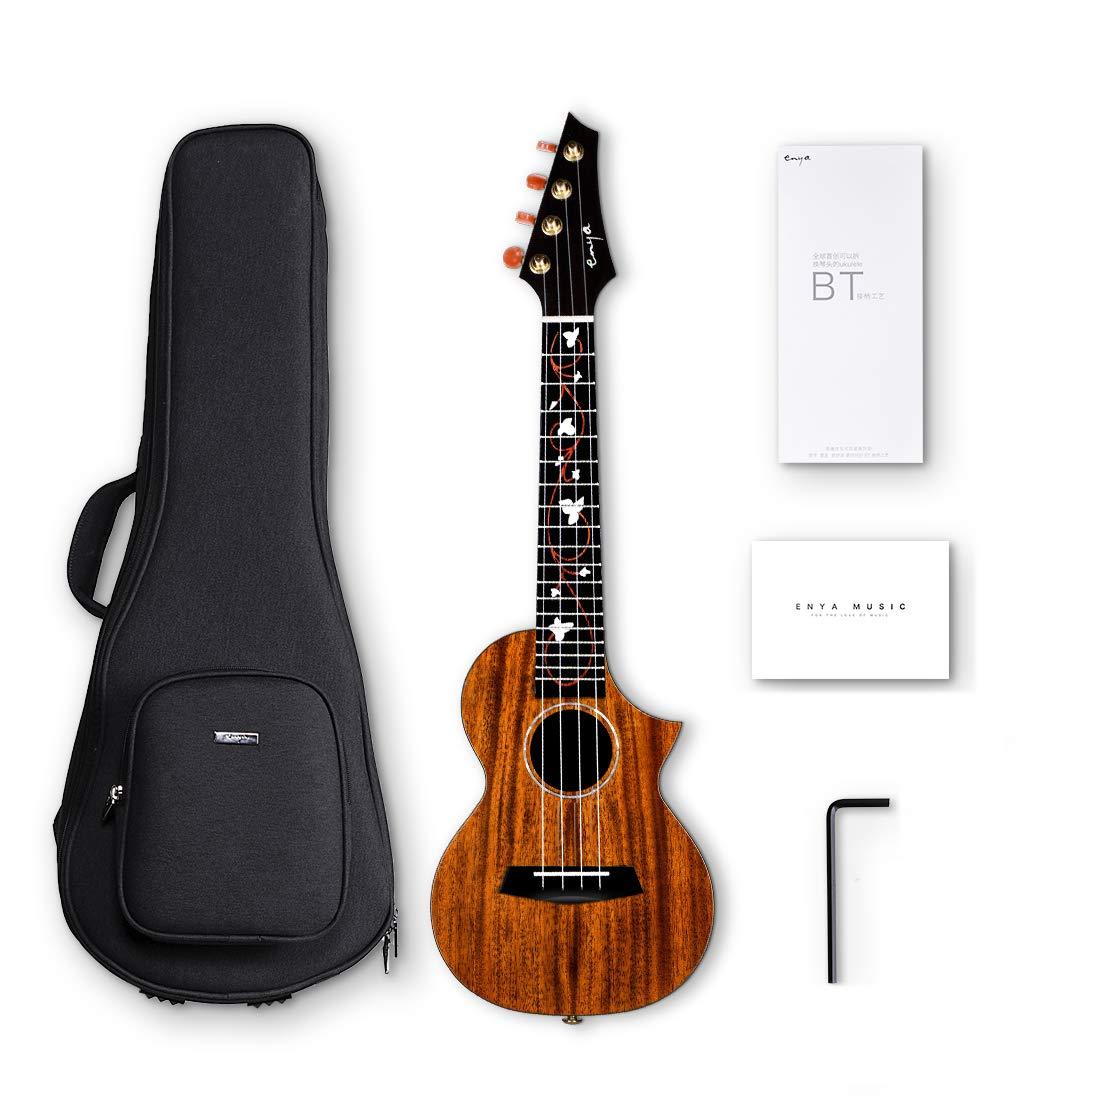 Enya EUT-M6 Cutaway Tenor Ukulele 26 Inch All Solid Mahogany with DAddario Strings Beautiful Inlay and Gloss Finish